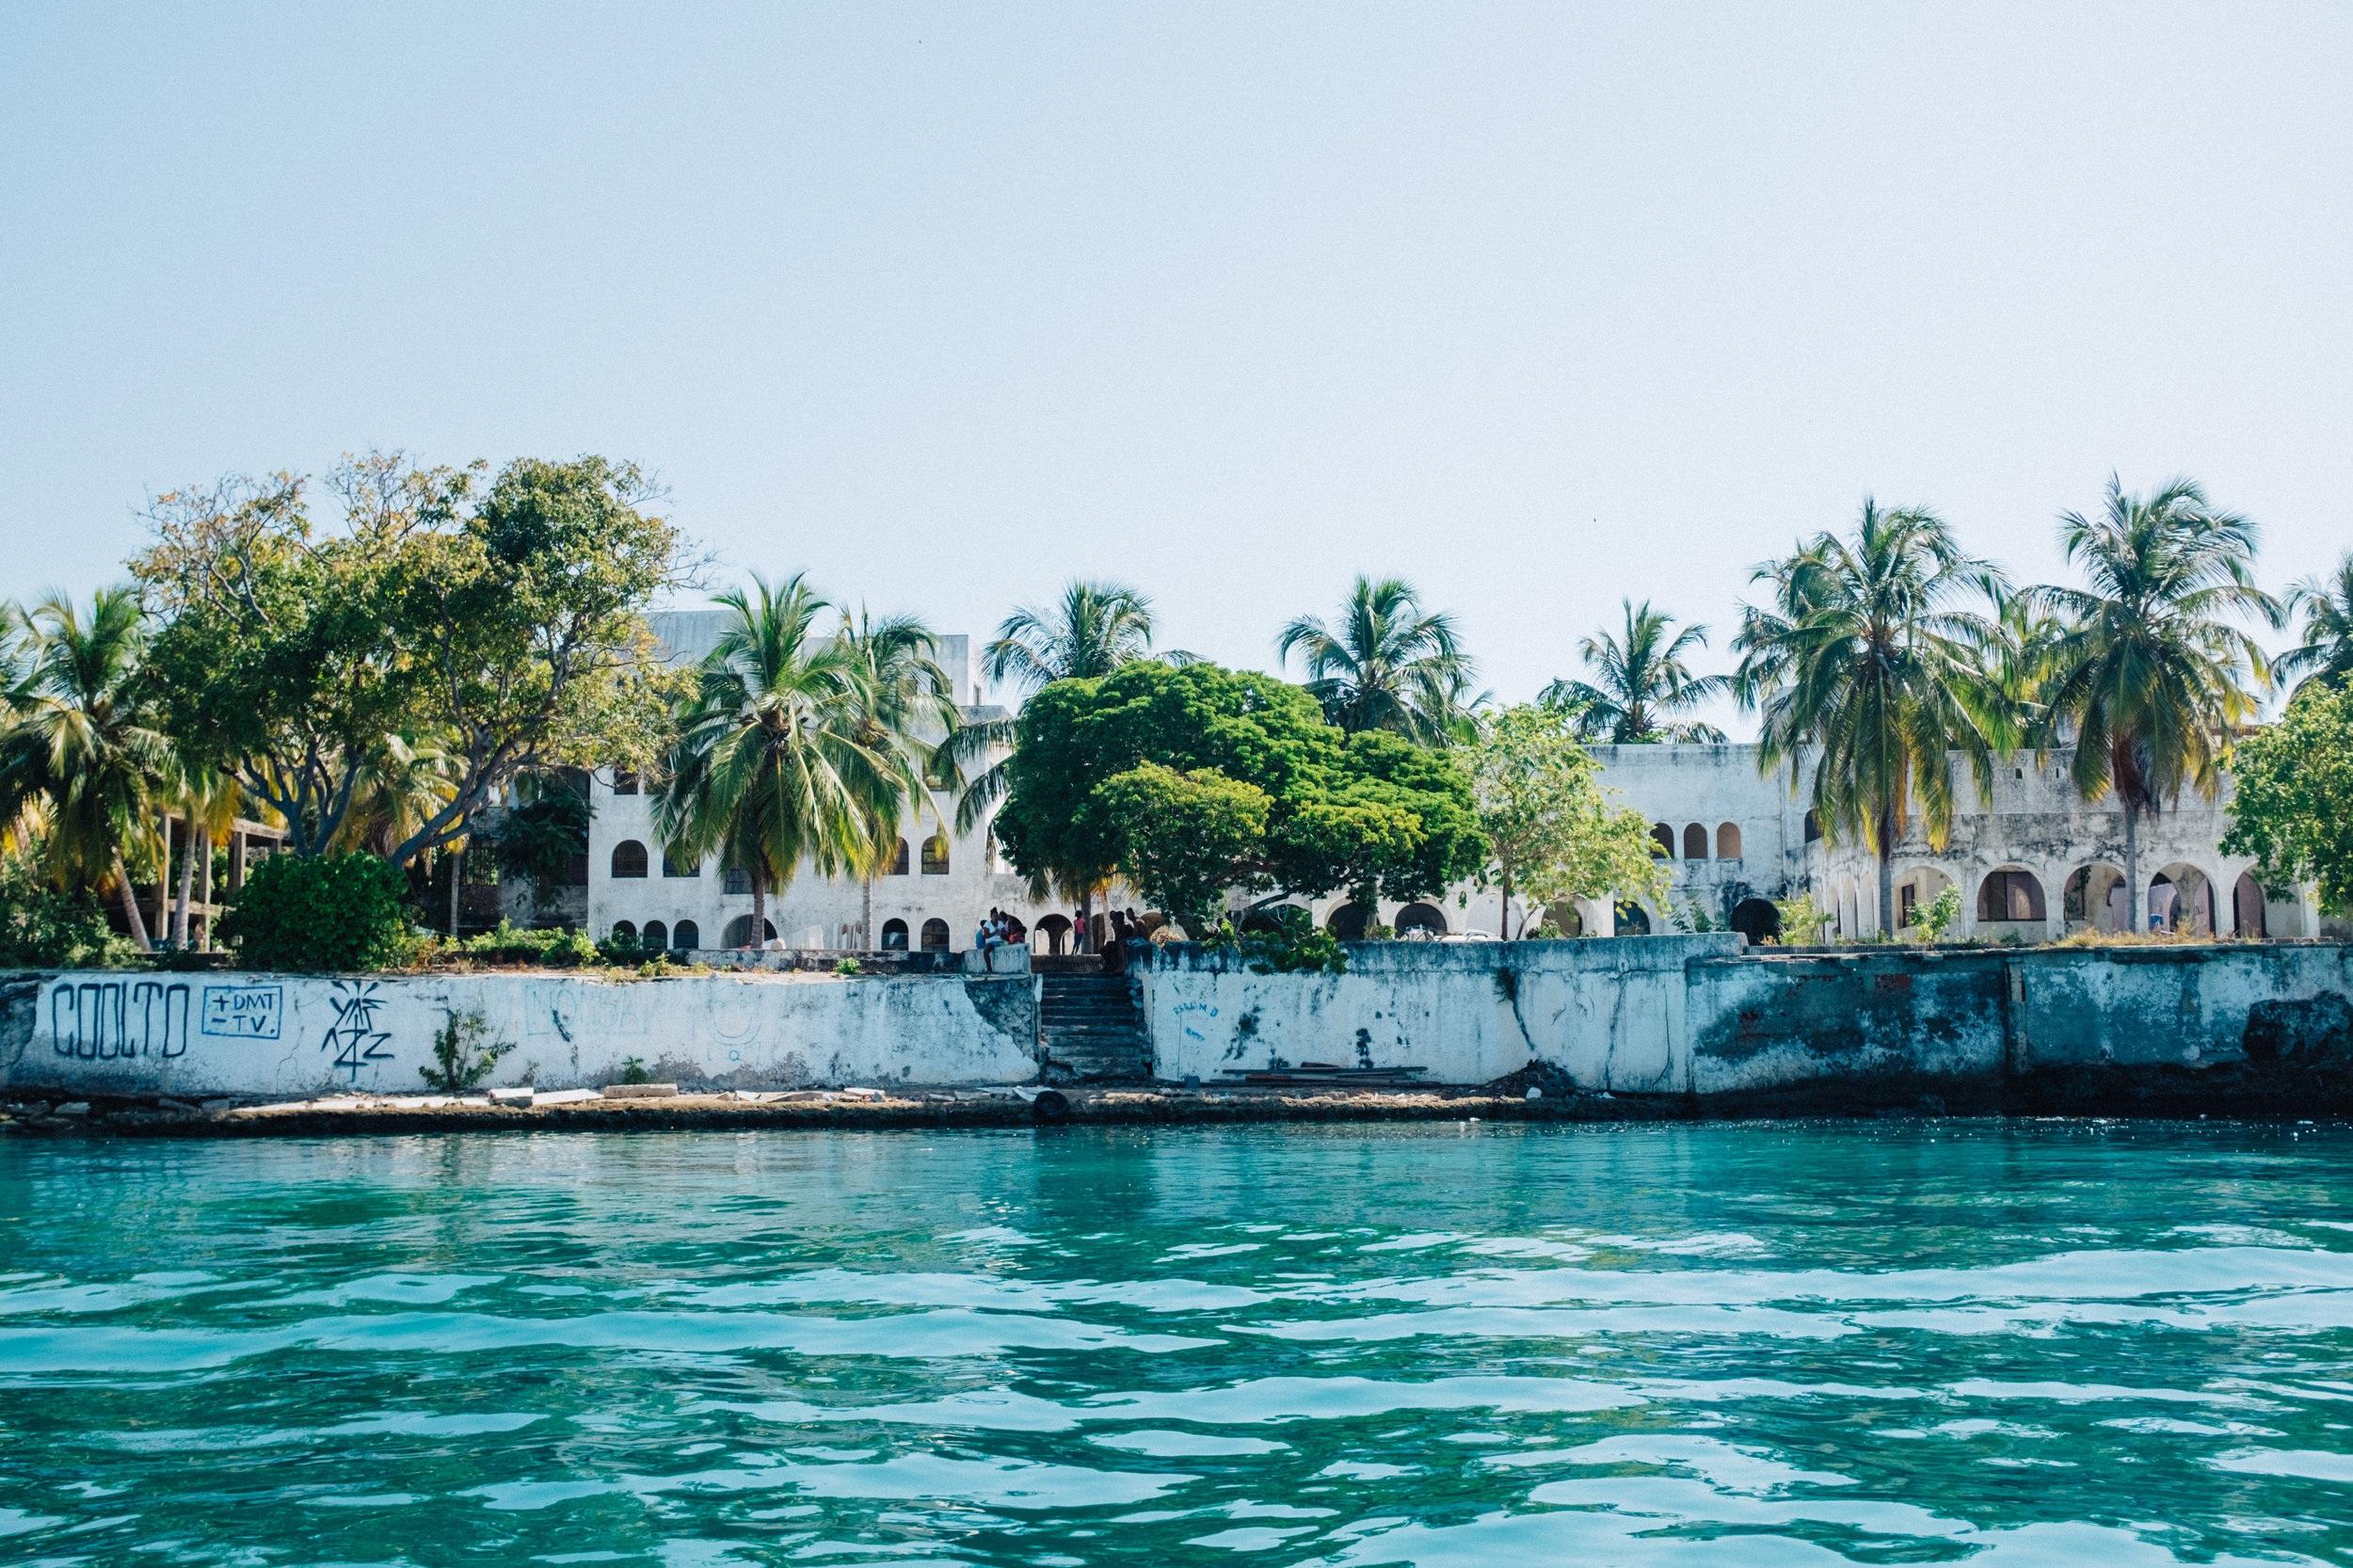 Pablo Escobar's Beach House